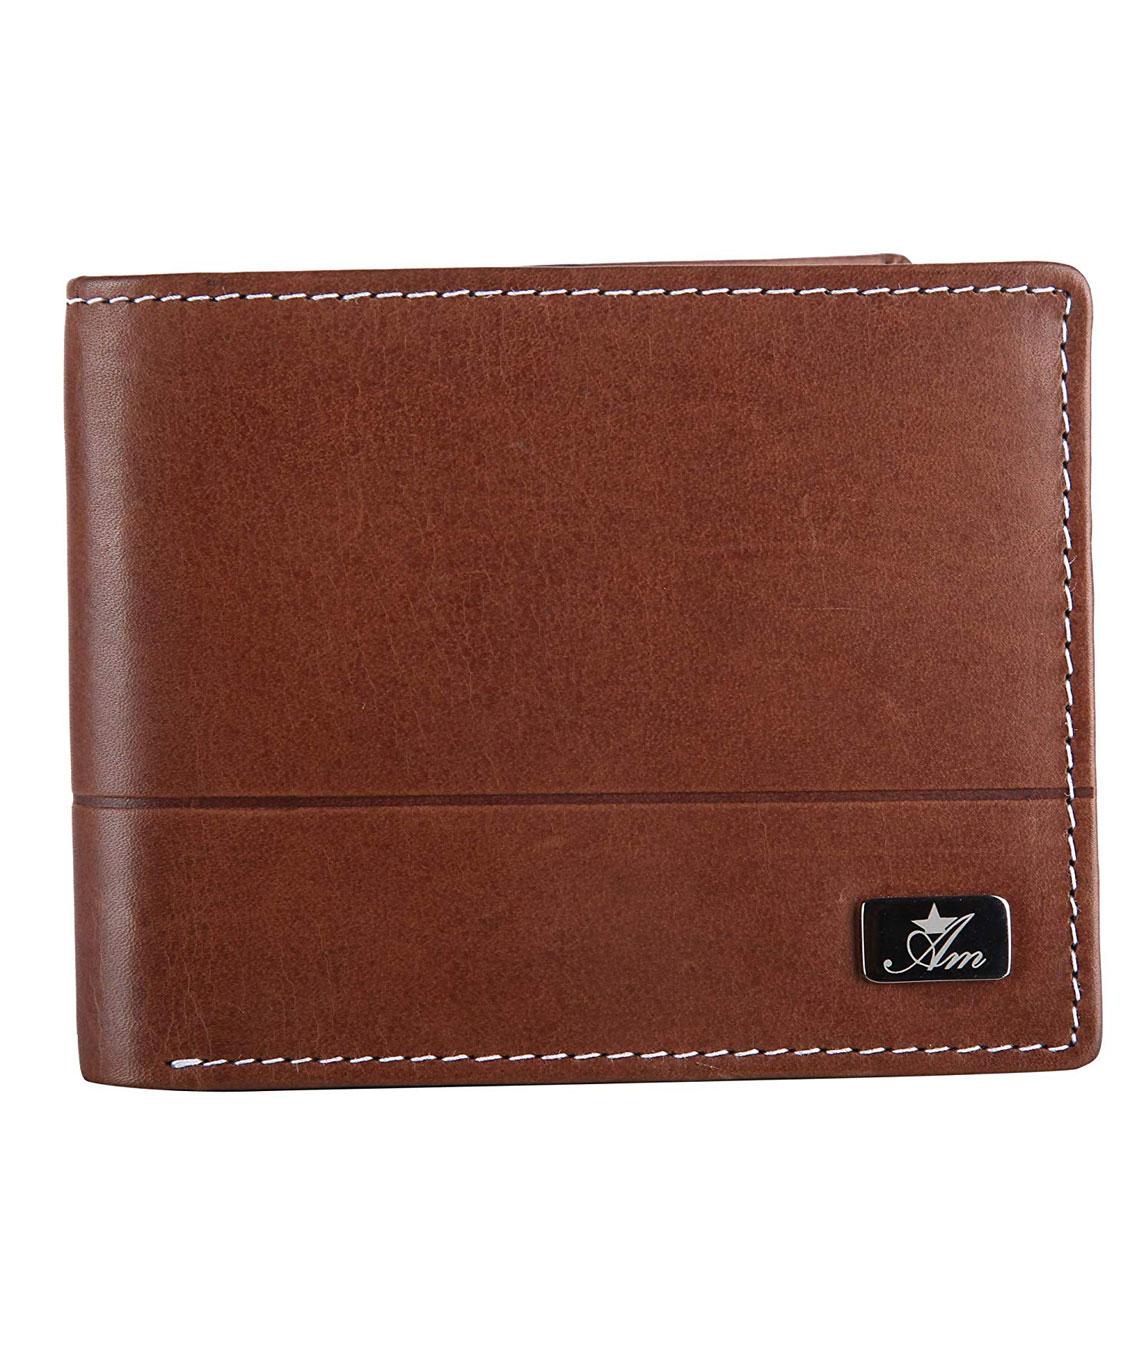 Am Leather Men Crazy Horse Leather Wallet for Men`s - Brown